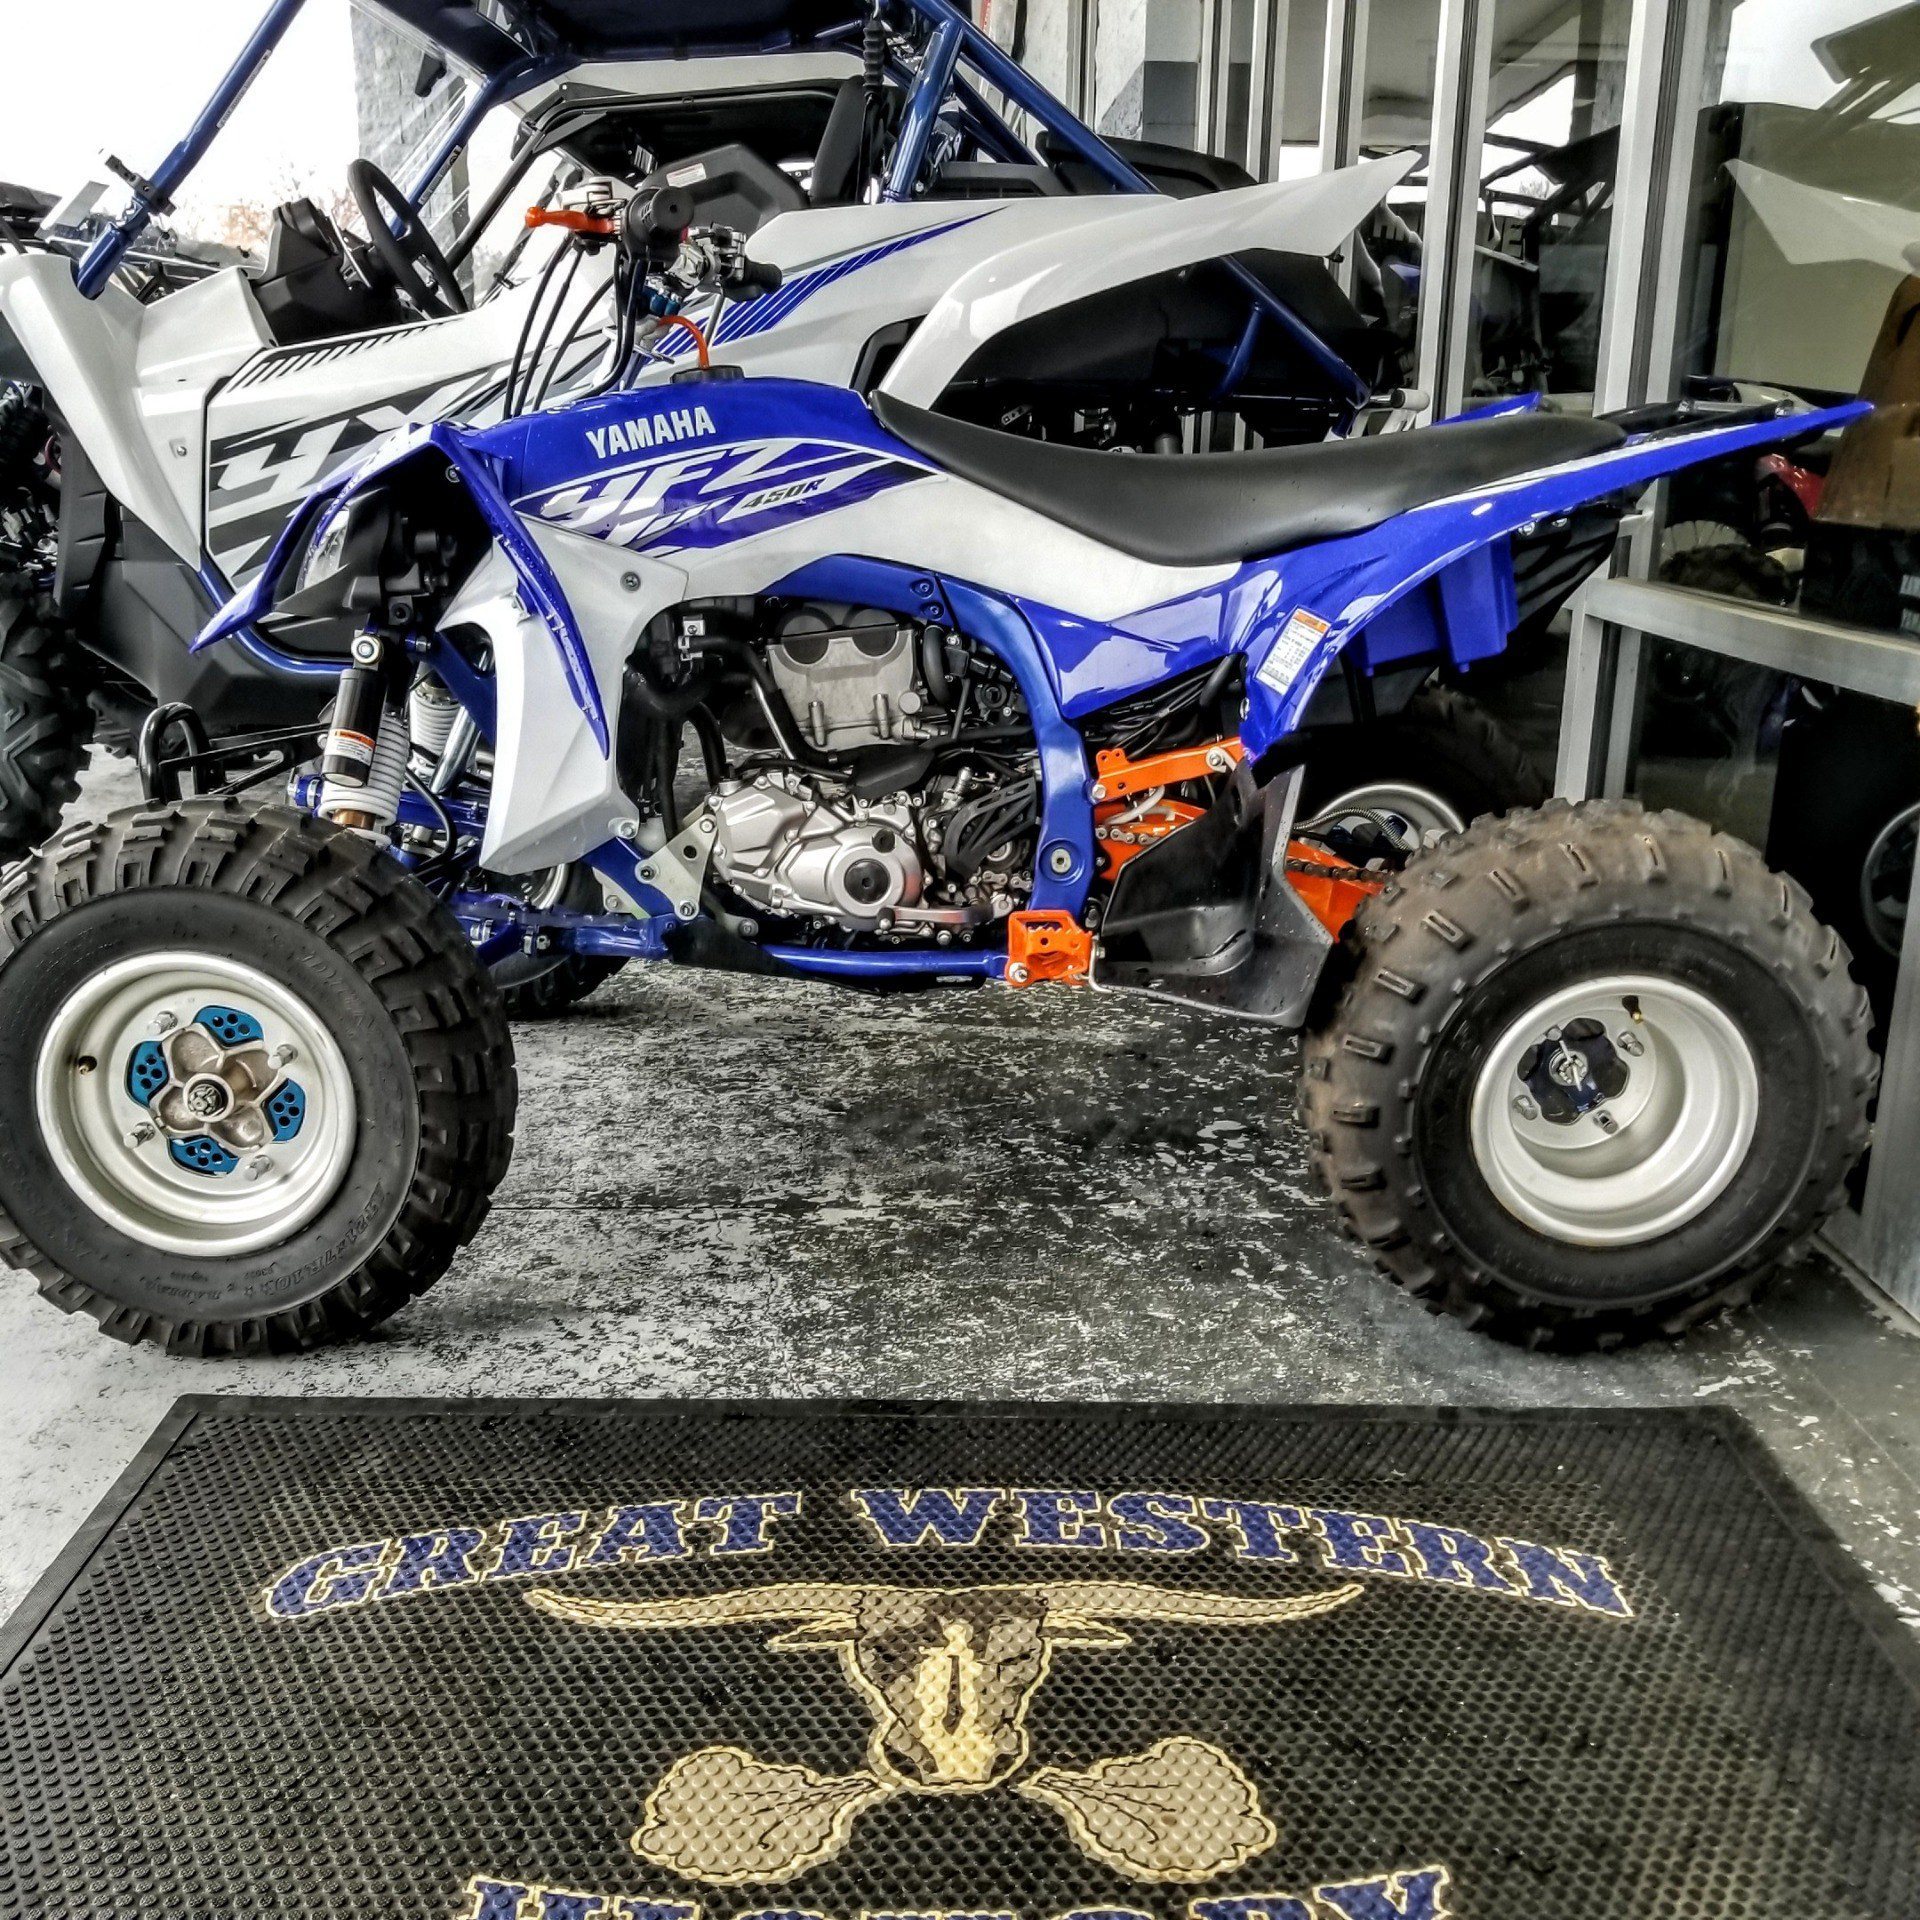 2018 Yamaha YFZ450R for sale 104082